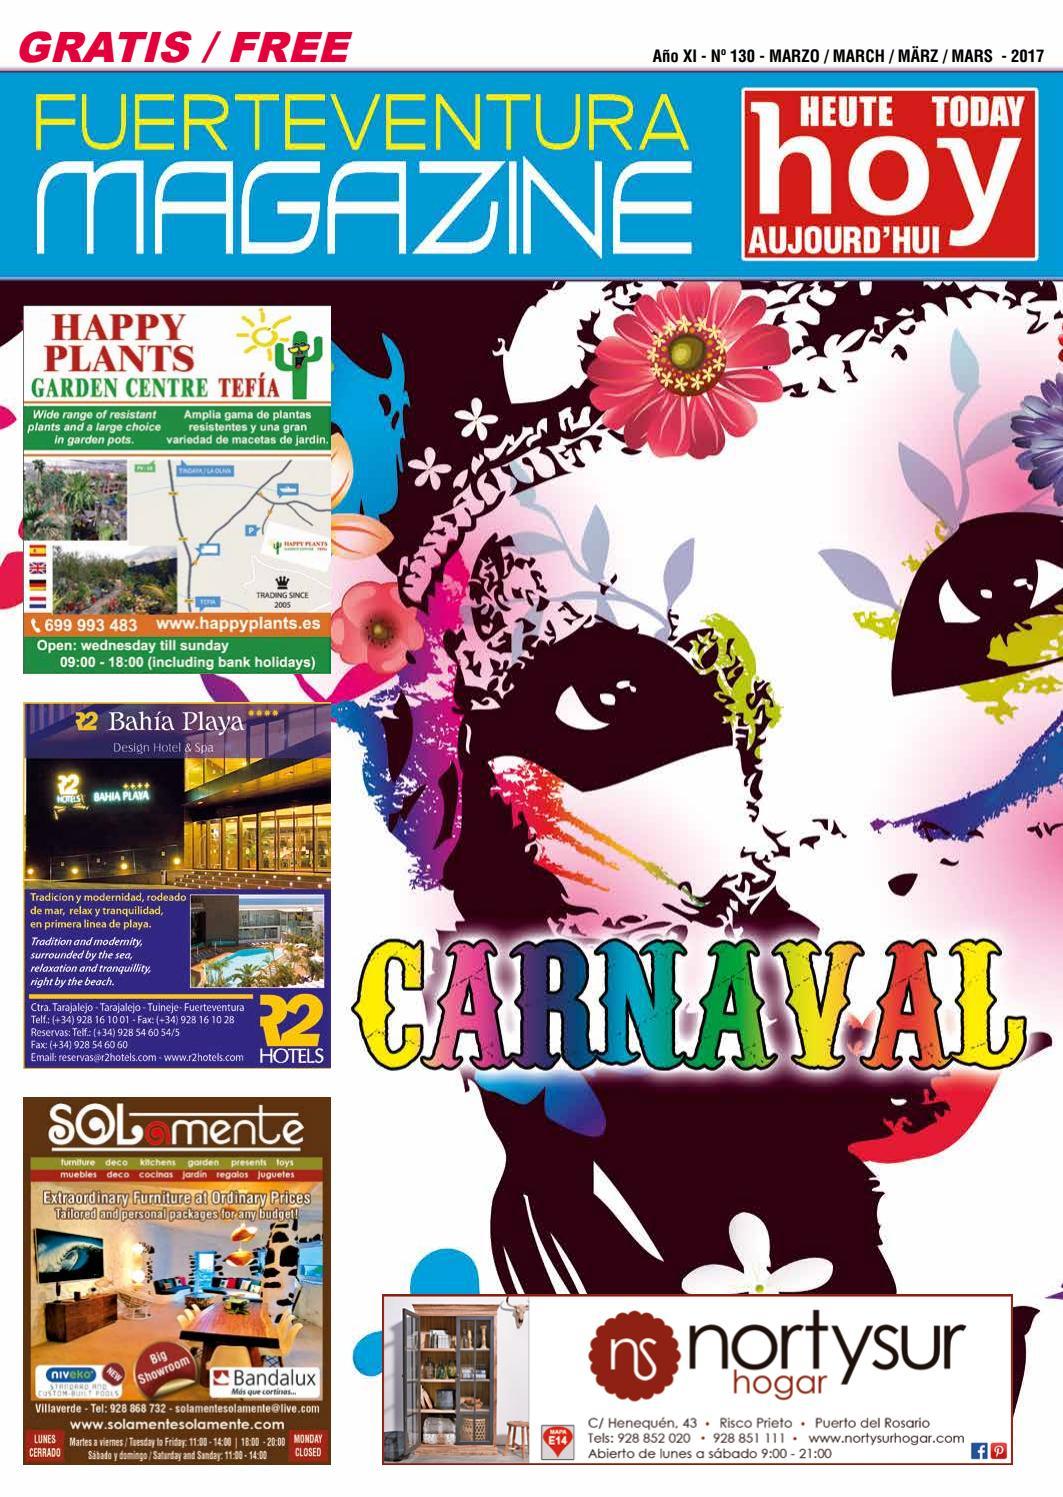 Fuerteventura Magazine Hoy Nº 130 Marzo 2017 By